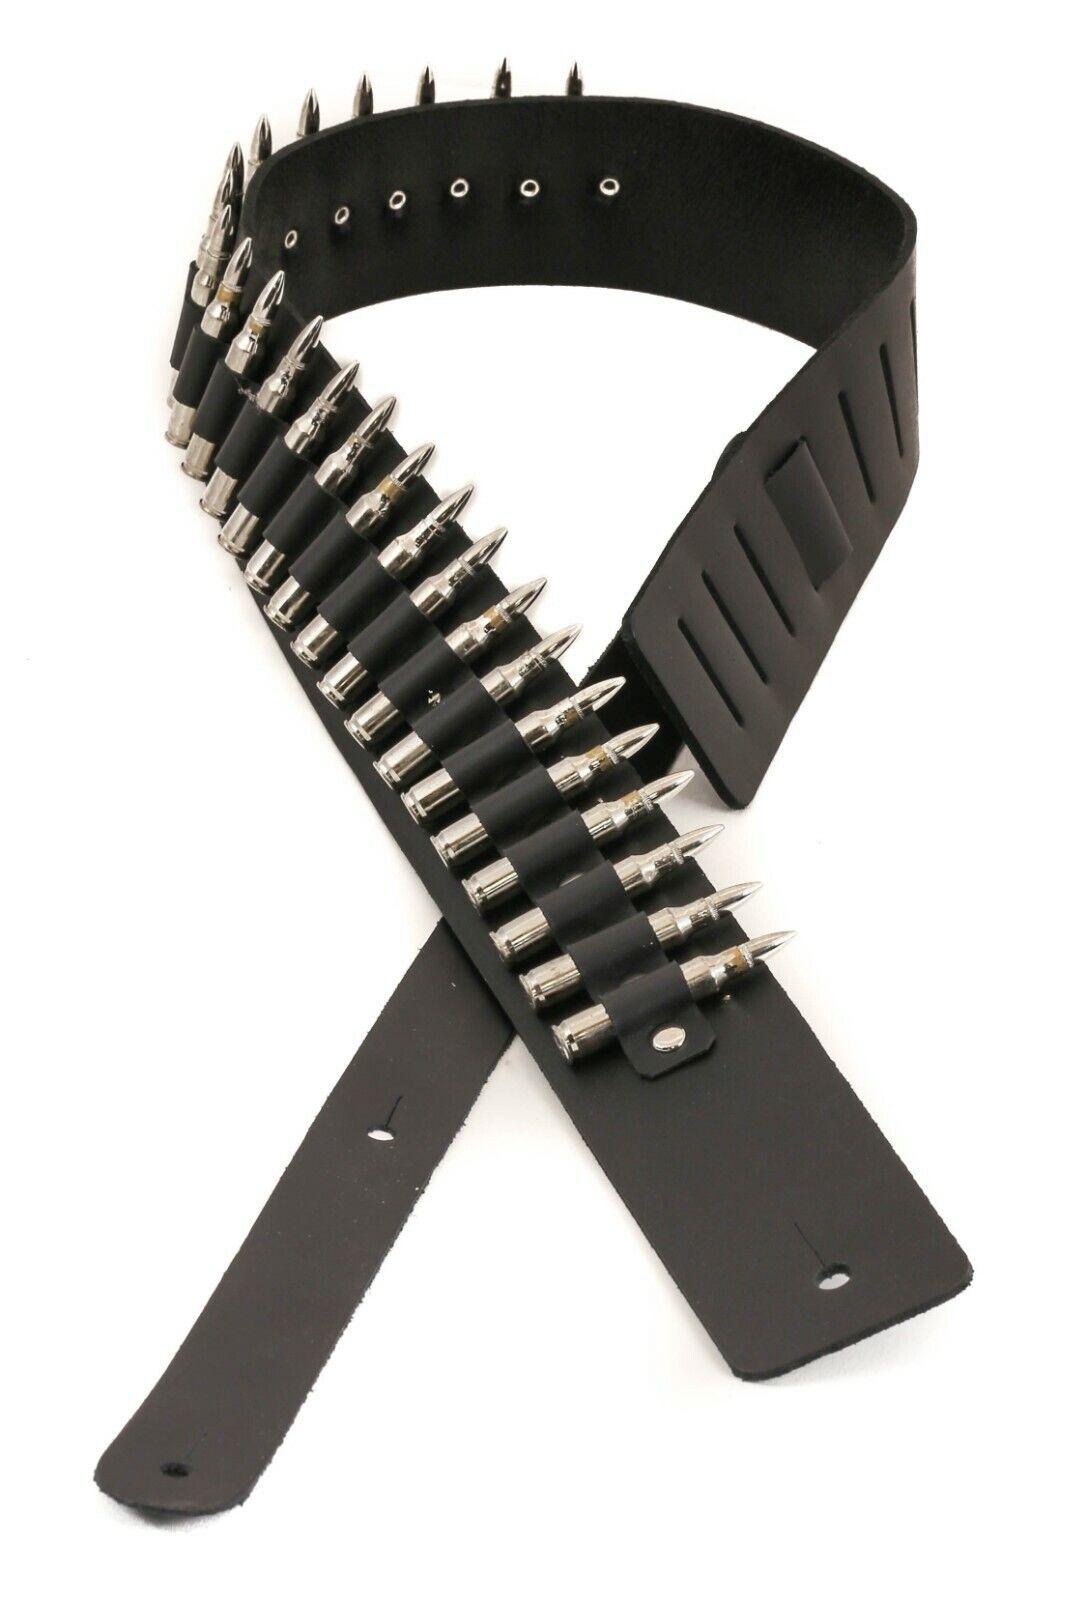 Bullet Belt Nickel Shell Nickel Conseils Calibre .223 Argent Lié Punk Rock Thrash